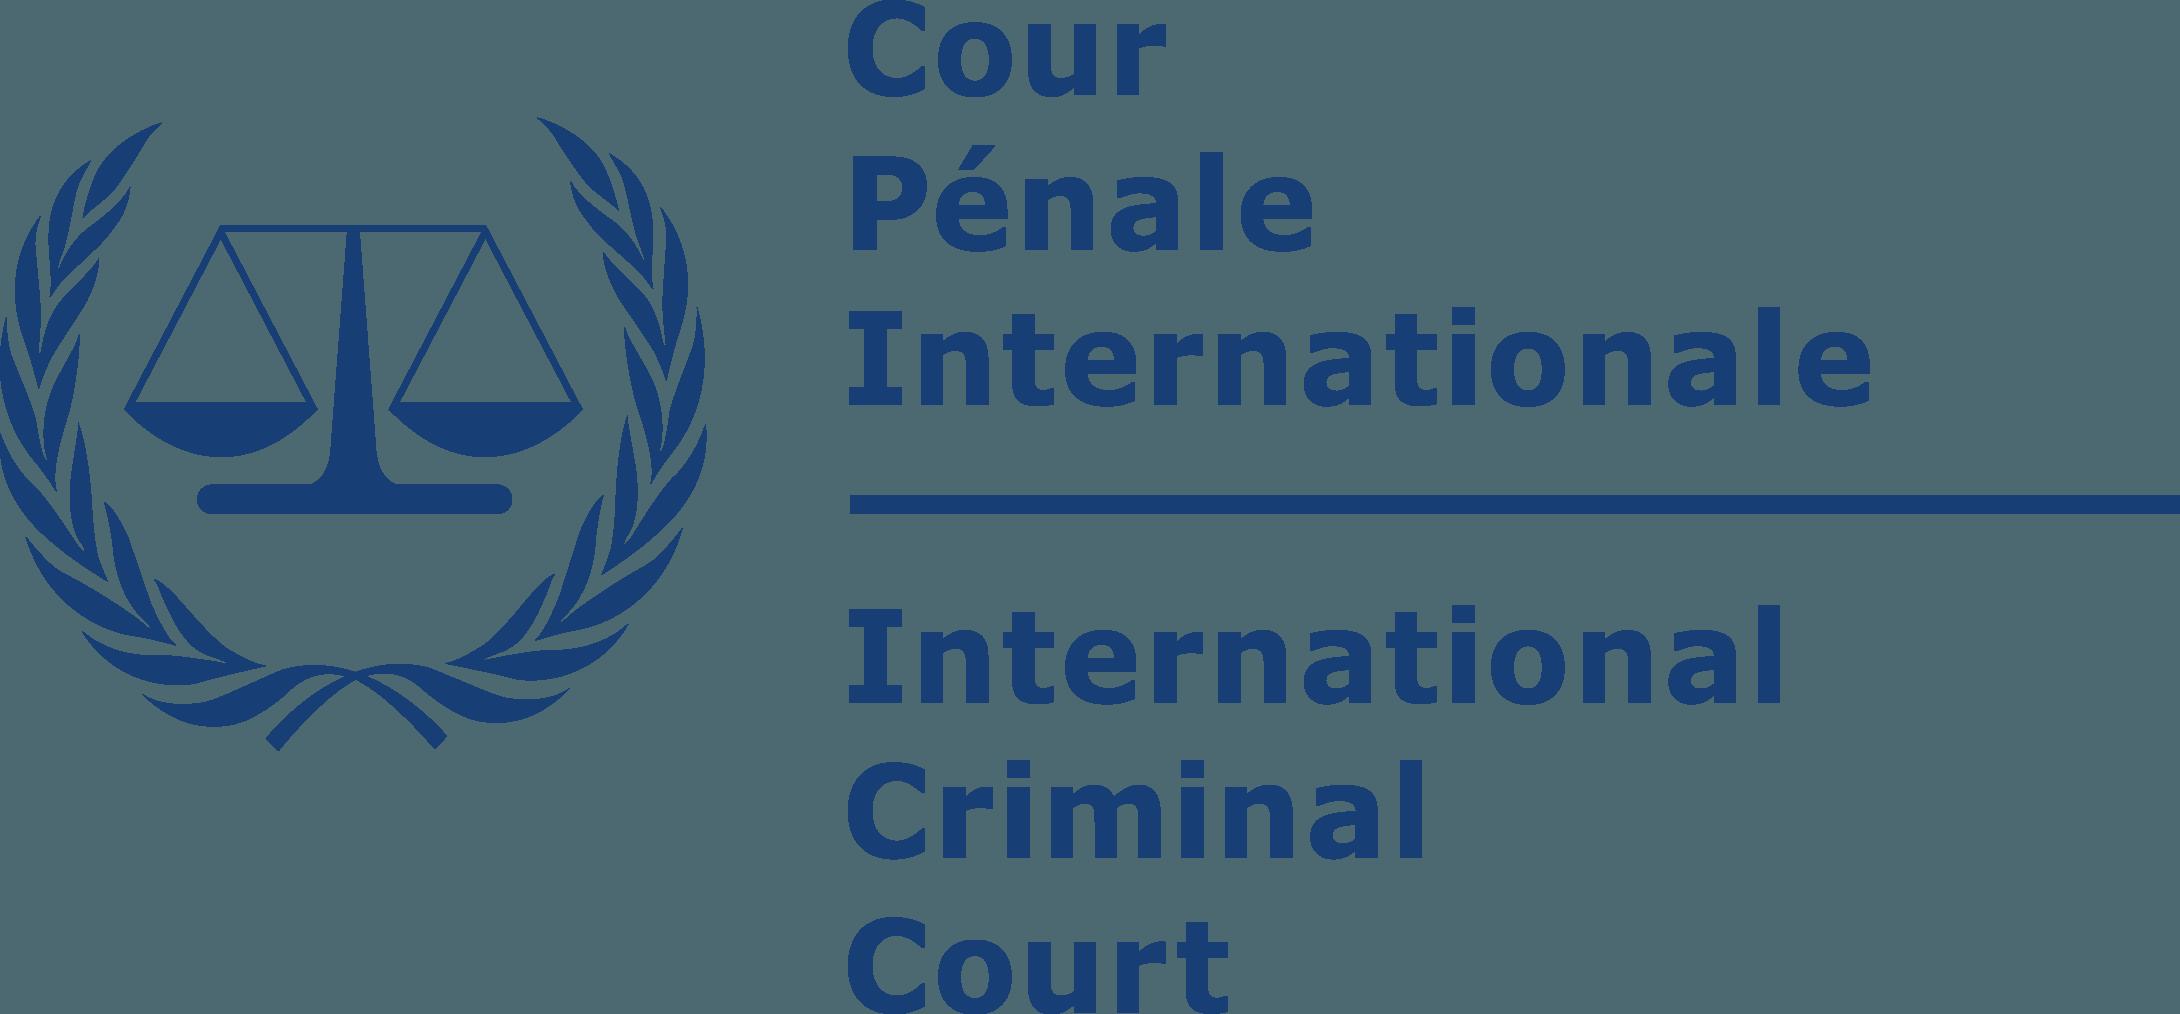 ICC   International Criminal Court Logo [icc cpi.int] png